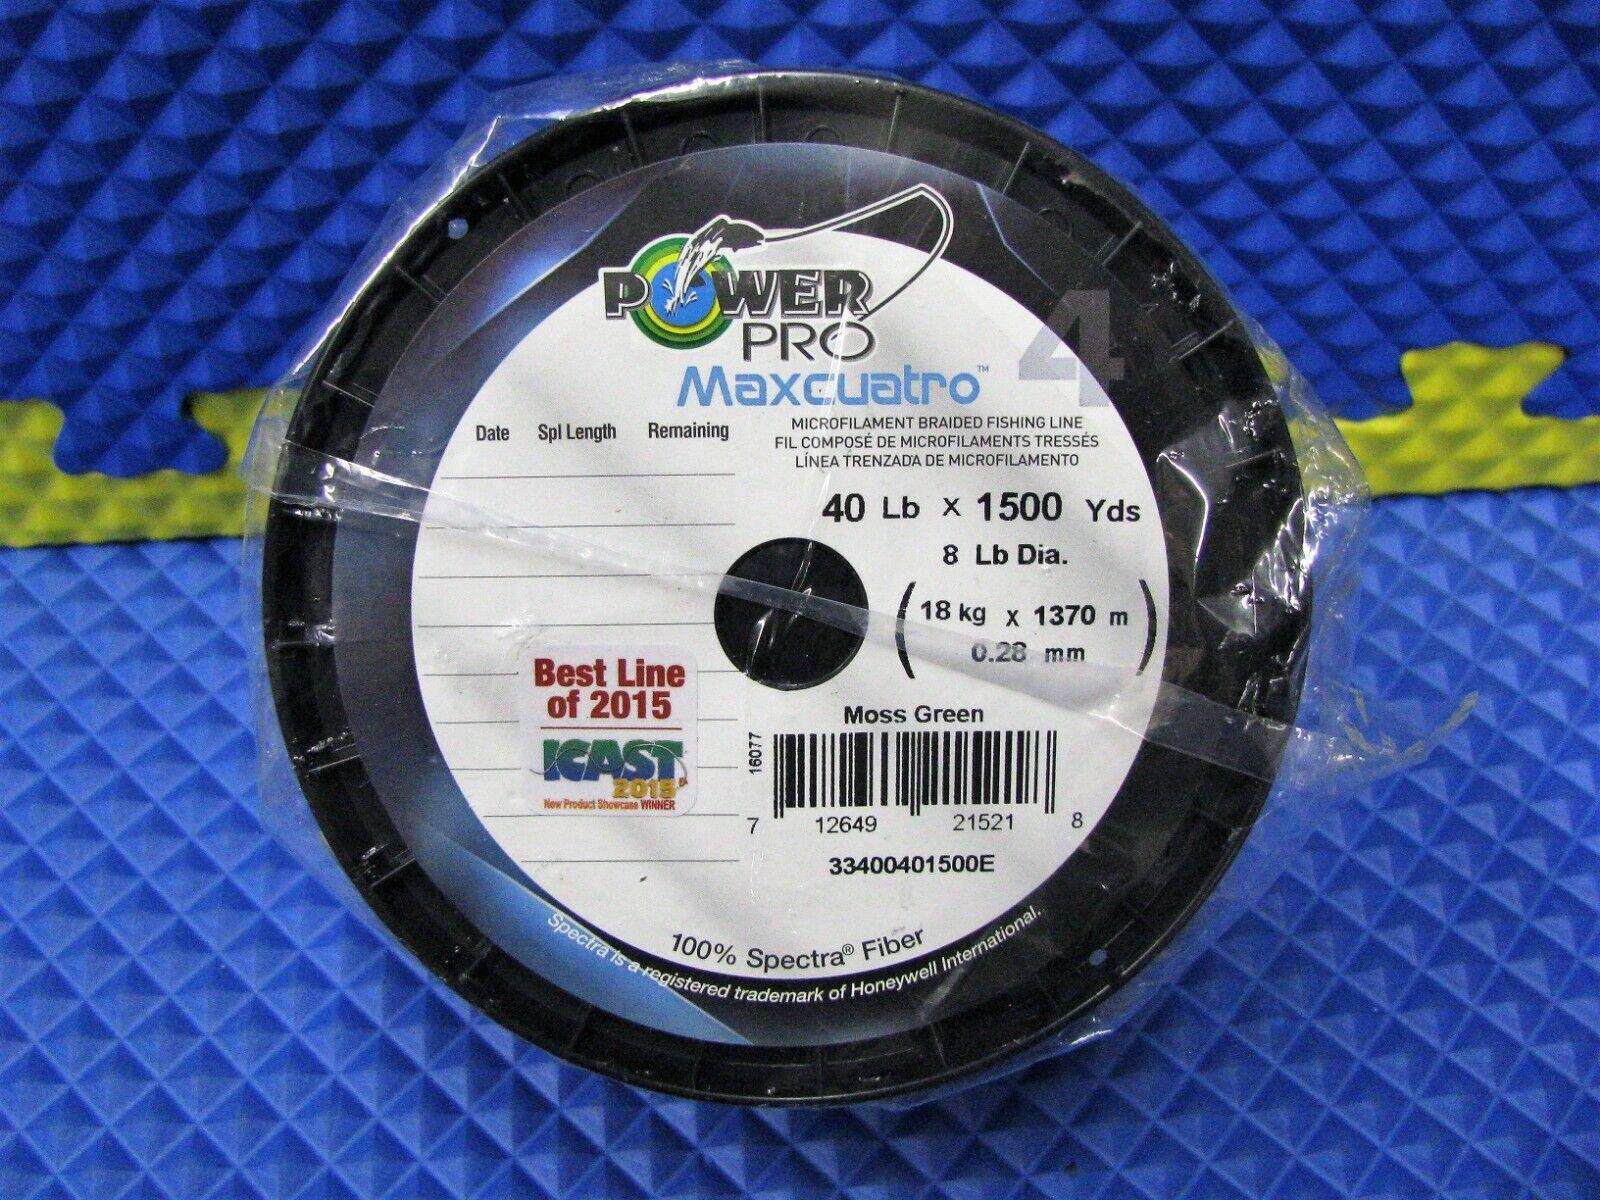 PowerPro Maxcuatro Microfilament Braided Fishing Line 40LB 1500Yds Moss Green